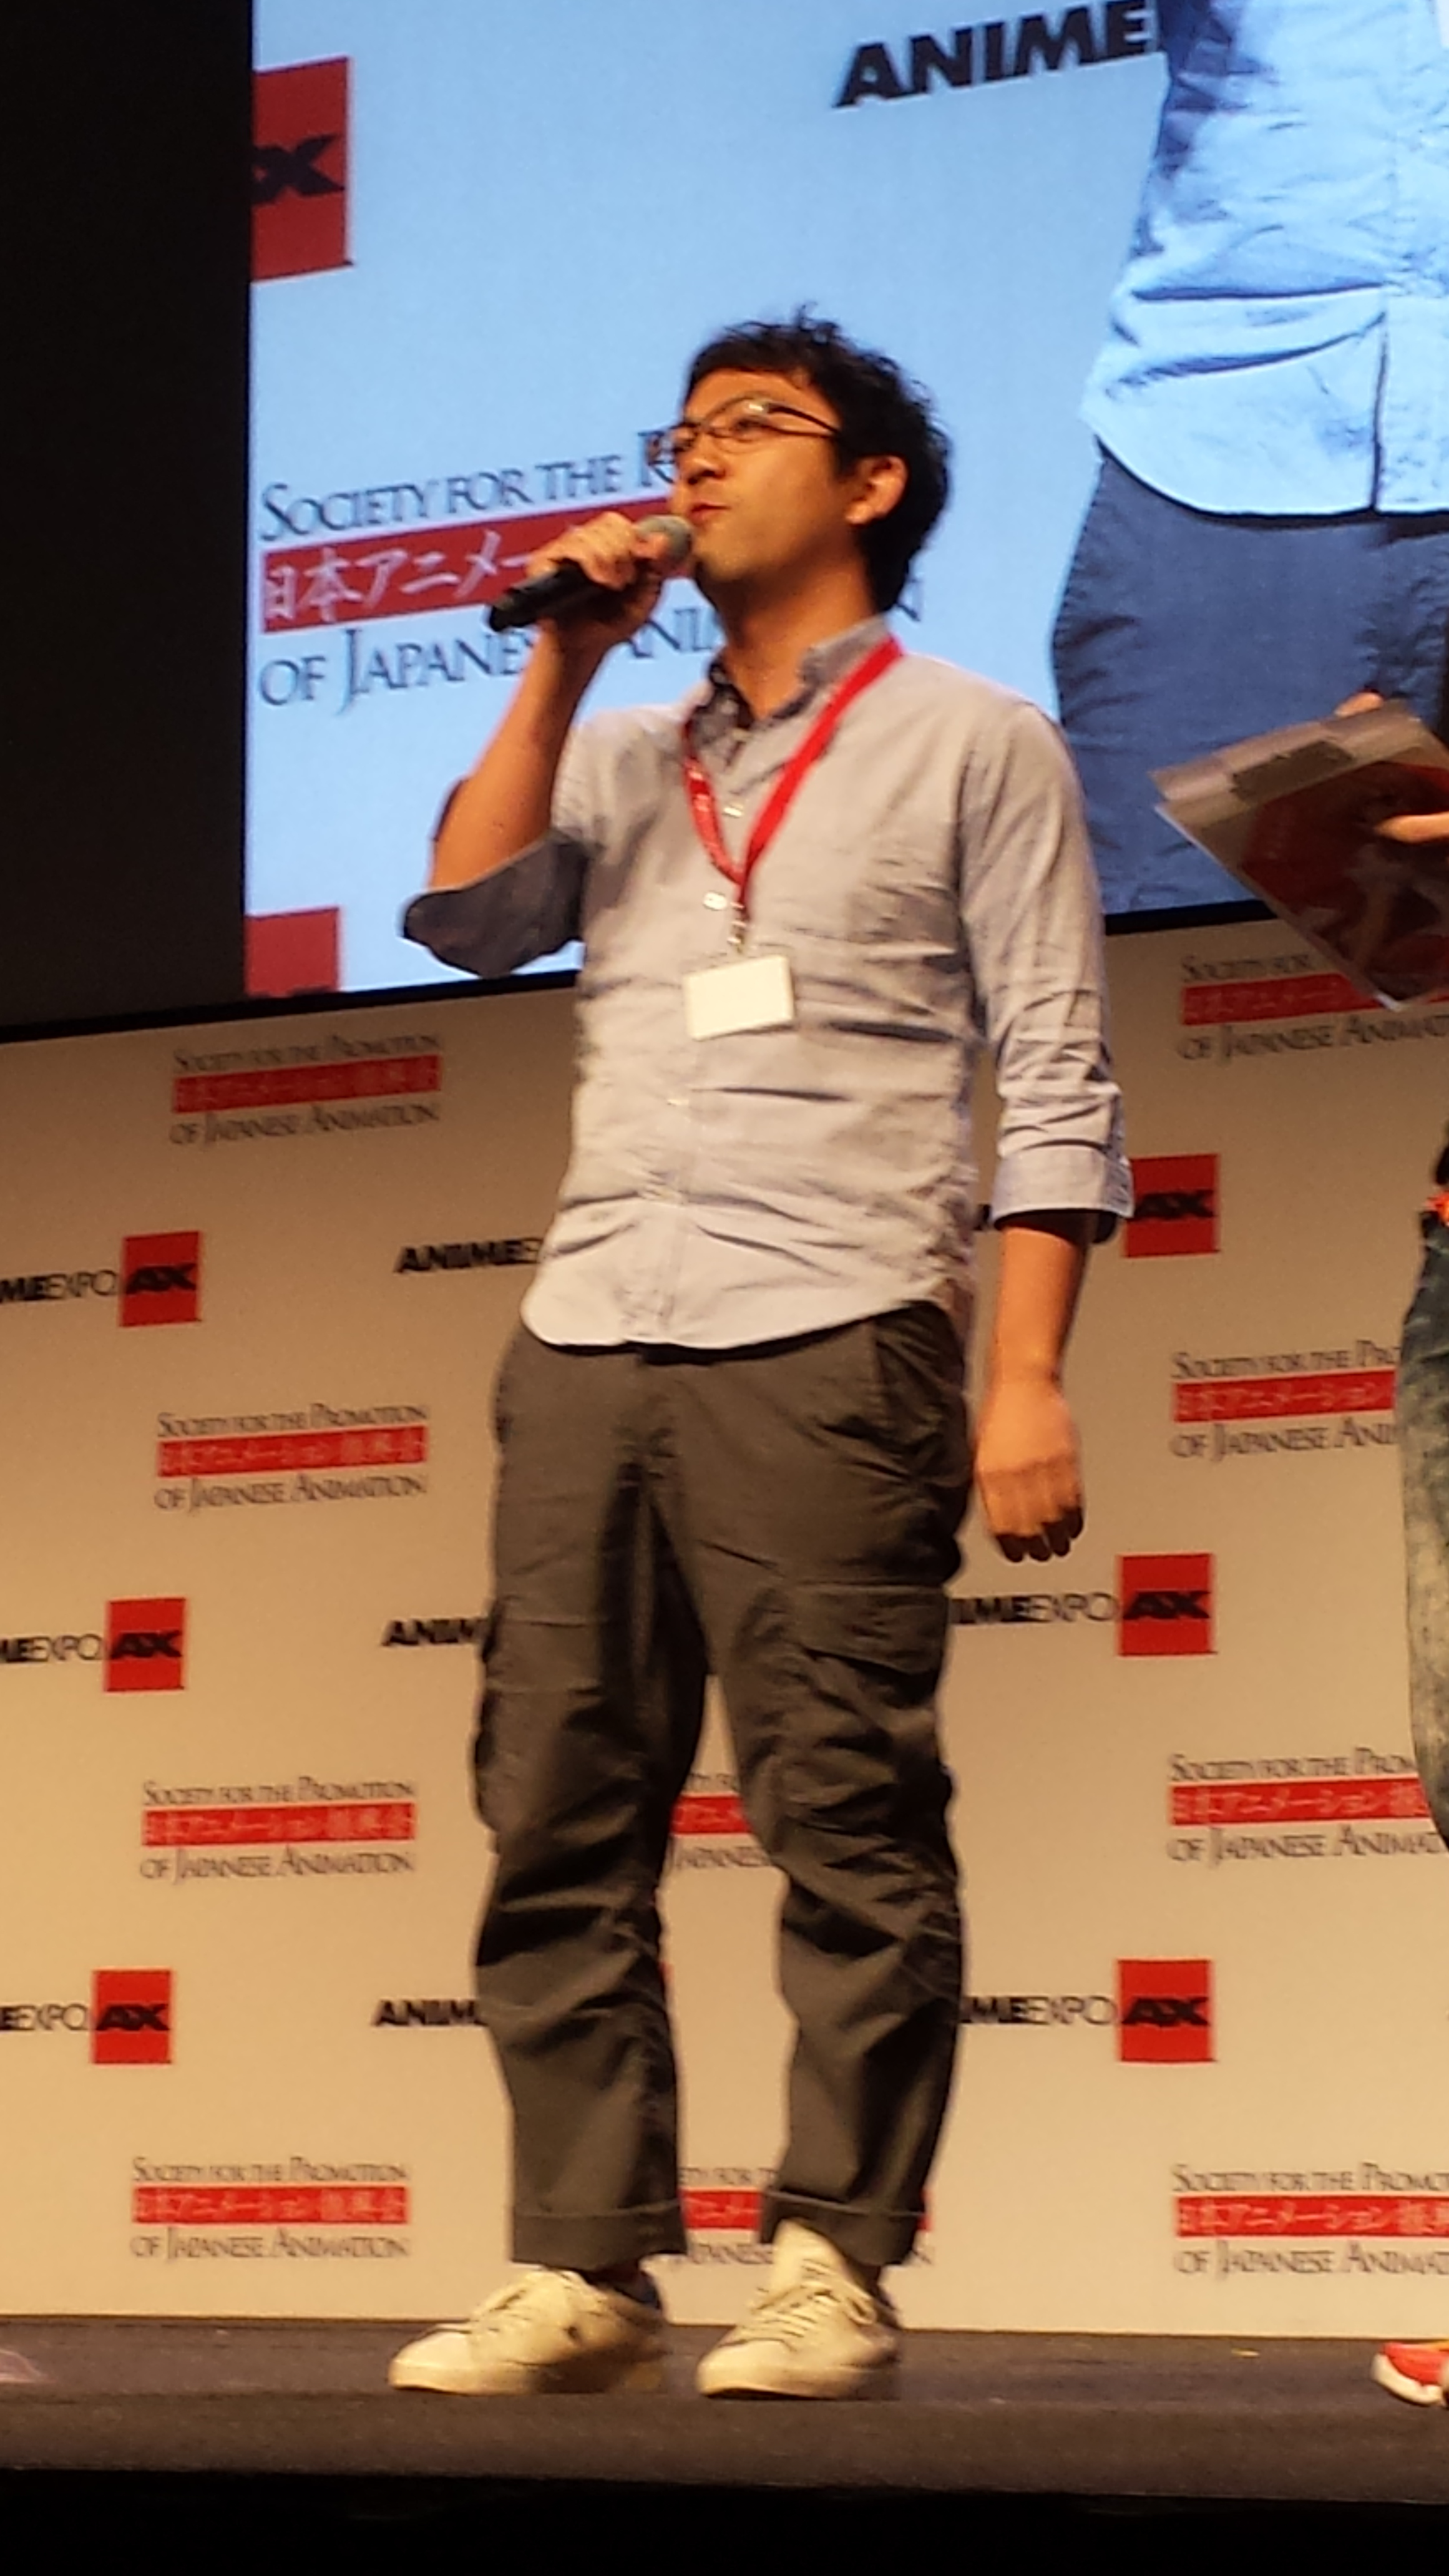 AnimeExpo 2013 - George Wada at closing ceremonies